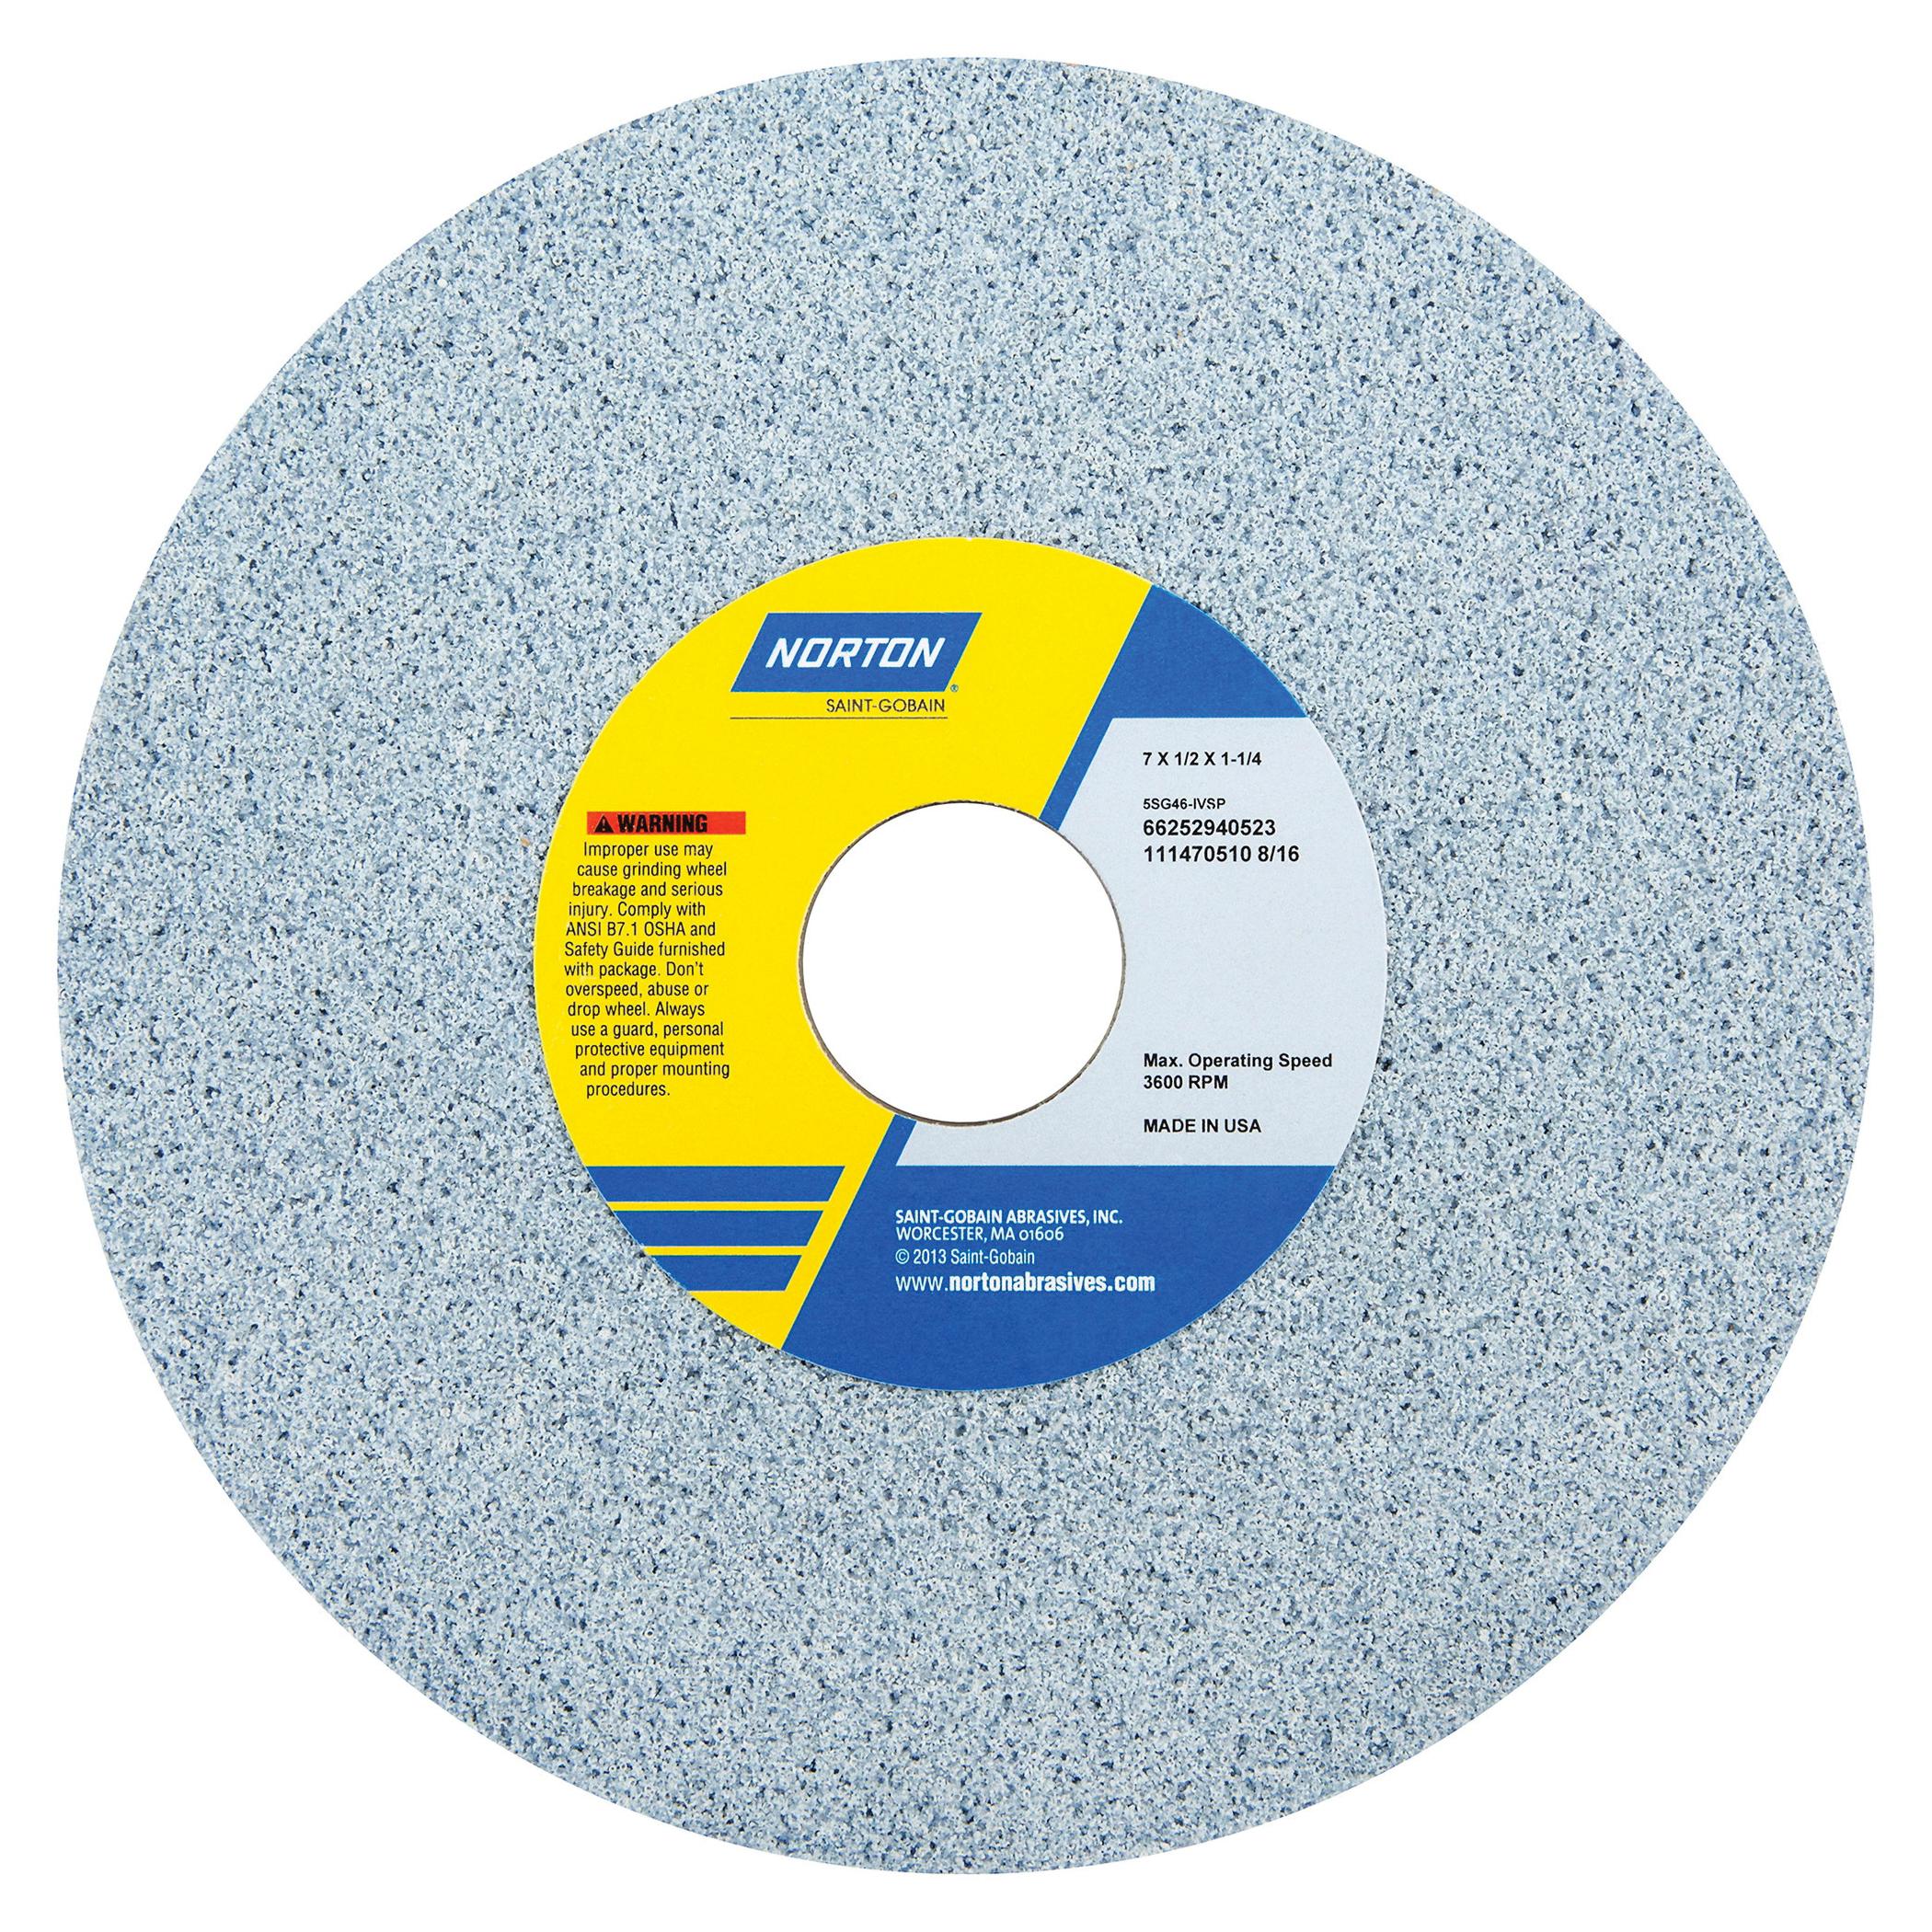 Norton® 66252940522 5SG Straight Toolroom Wheel, 7 in Dia x 1/2 in THK, 1-1/4 in Center Hole, 46 Grit, Ceramic Alumina/Friable Aluminum Oxide Abrasive